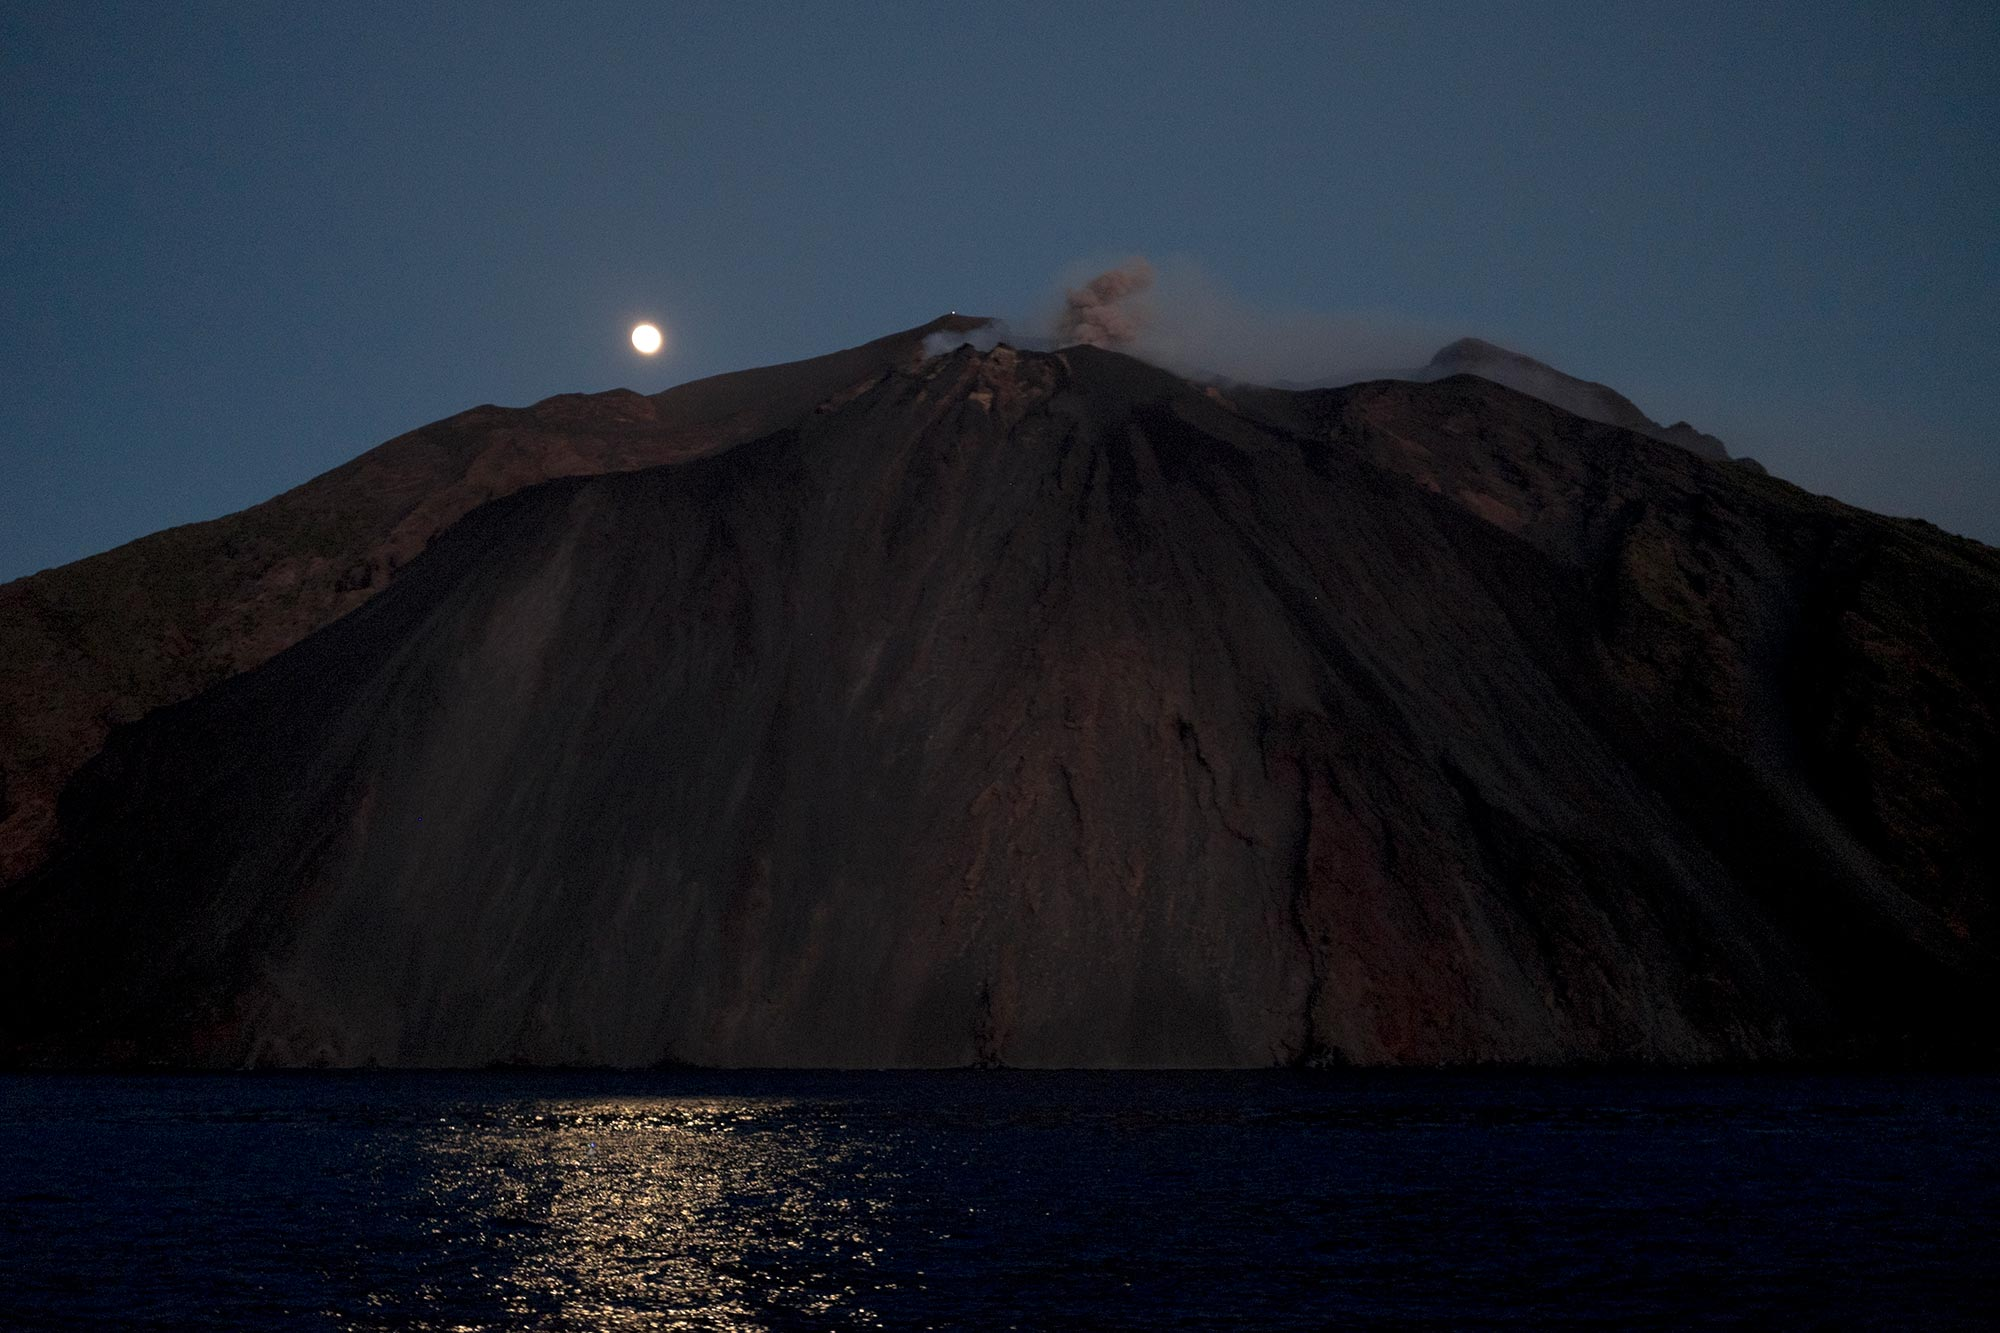 italy-sicilia-eolie-stromboli-italy-sicilia-eolie-stromboli-volcano-eruption-moon